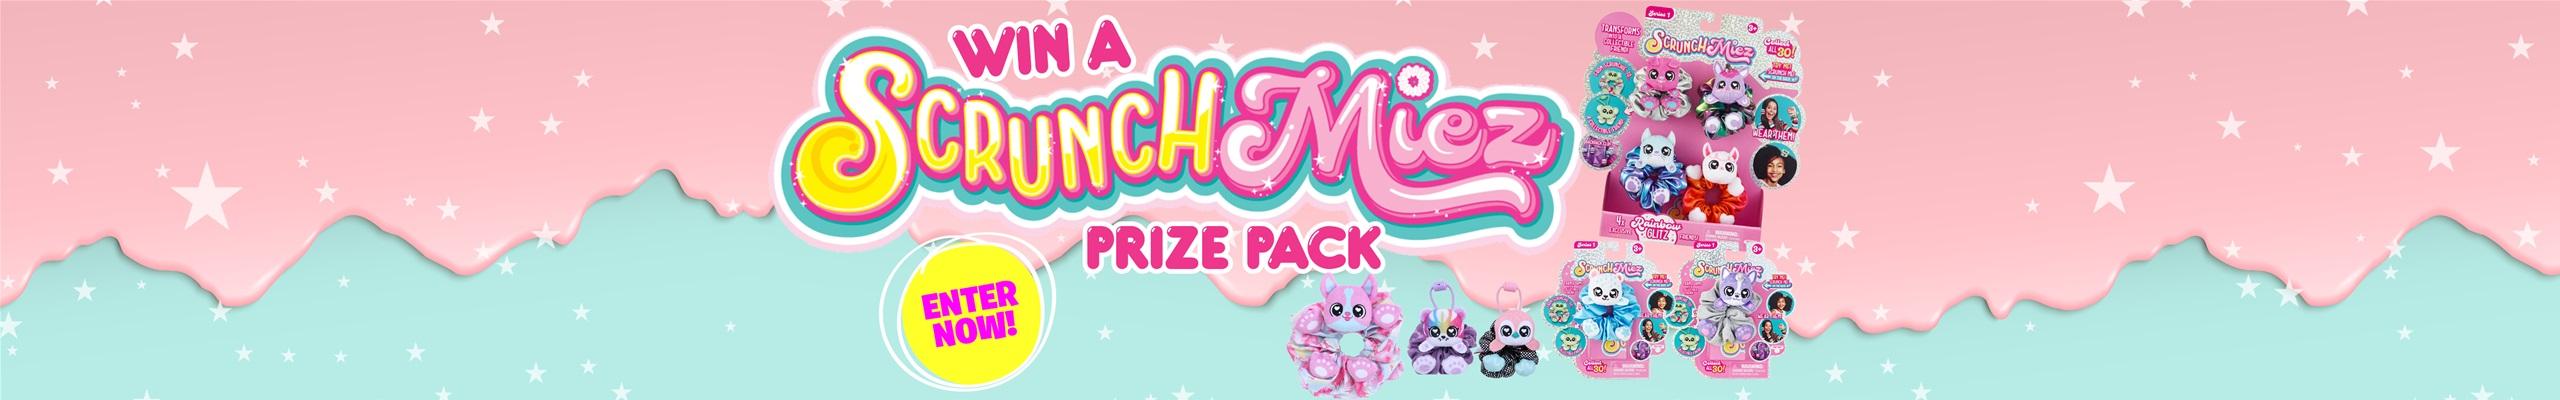 ScrunchMiez Prize Pack Giveaway